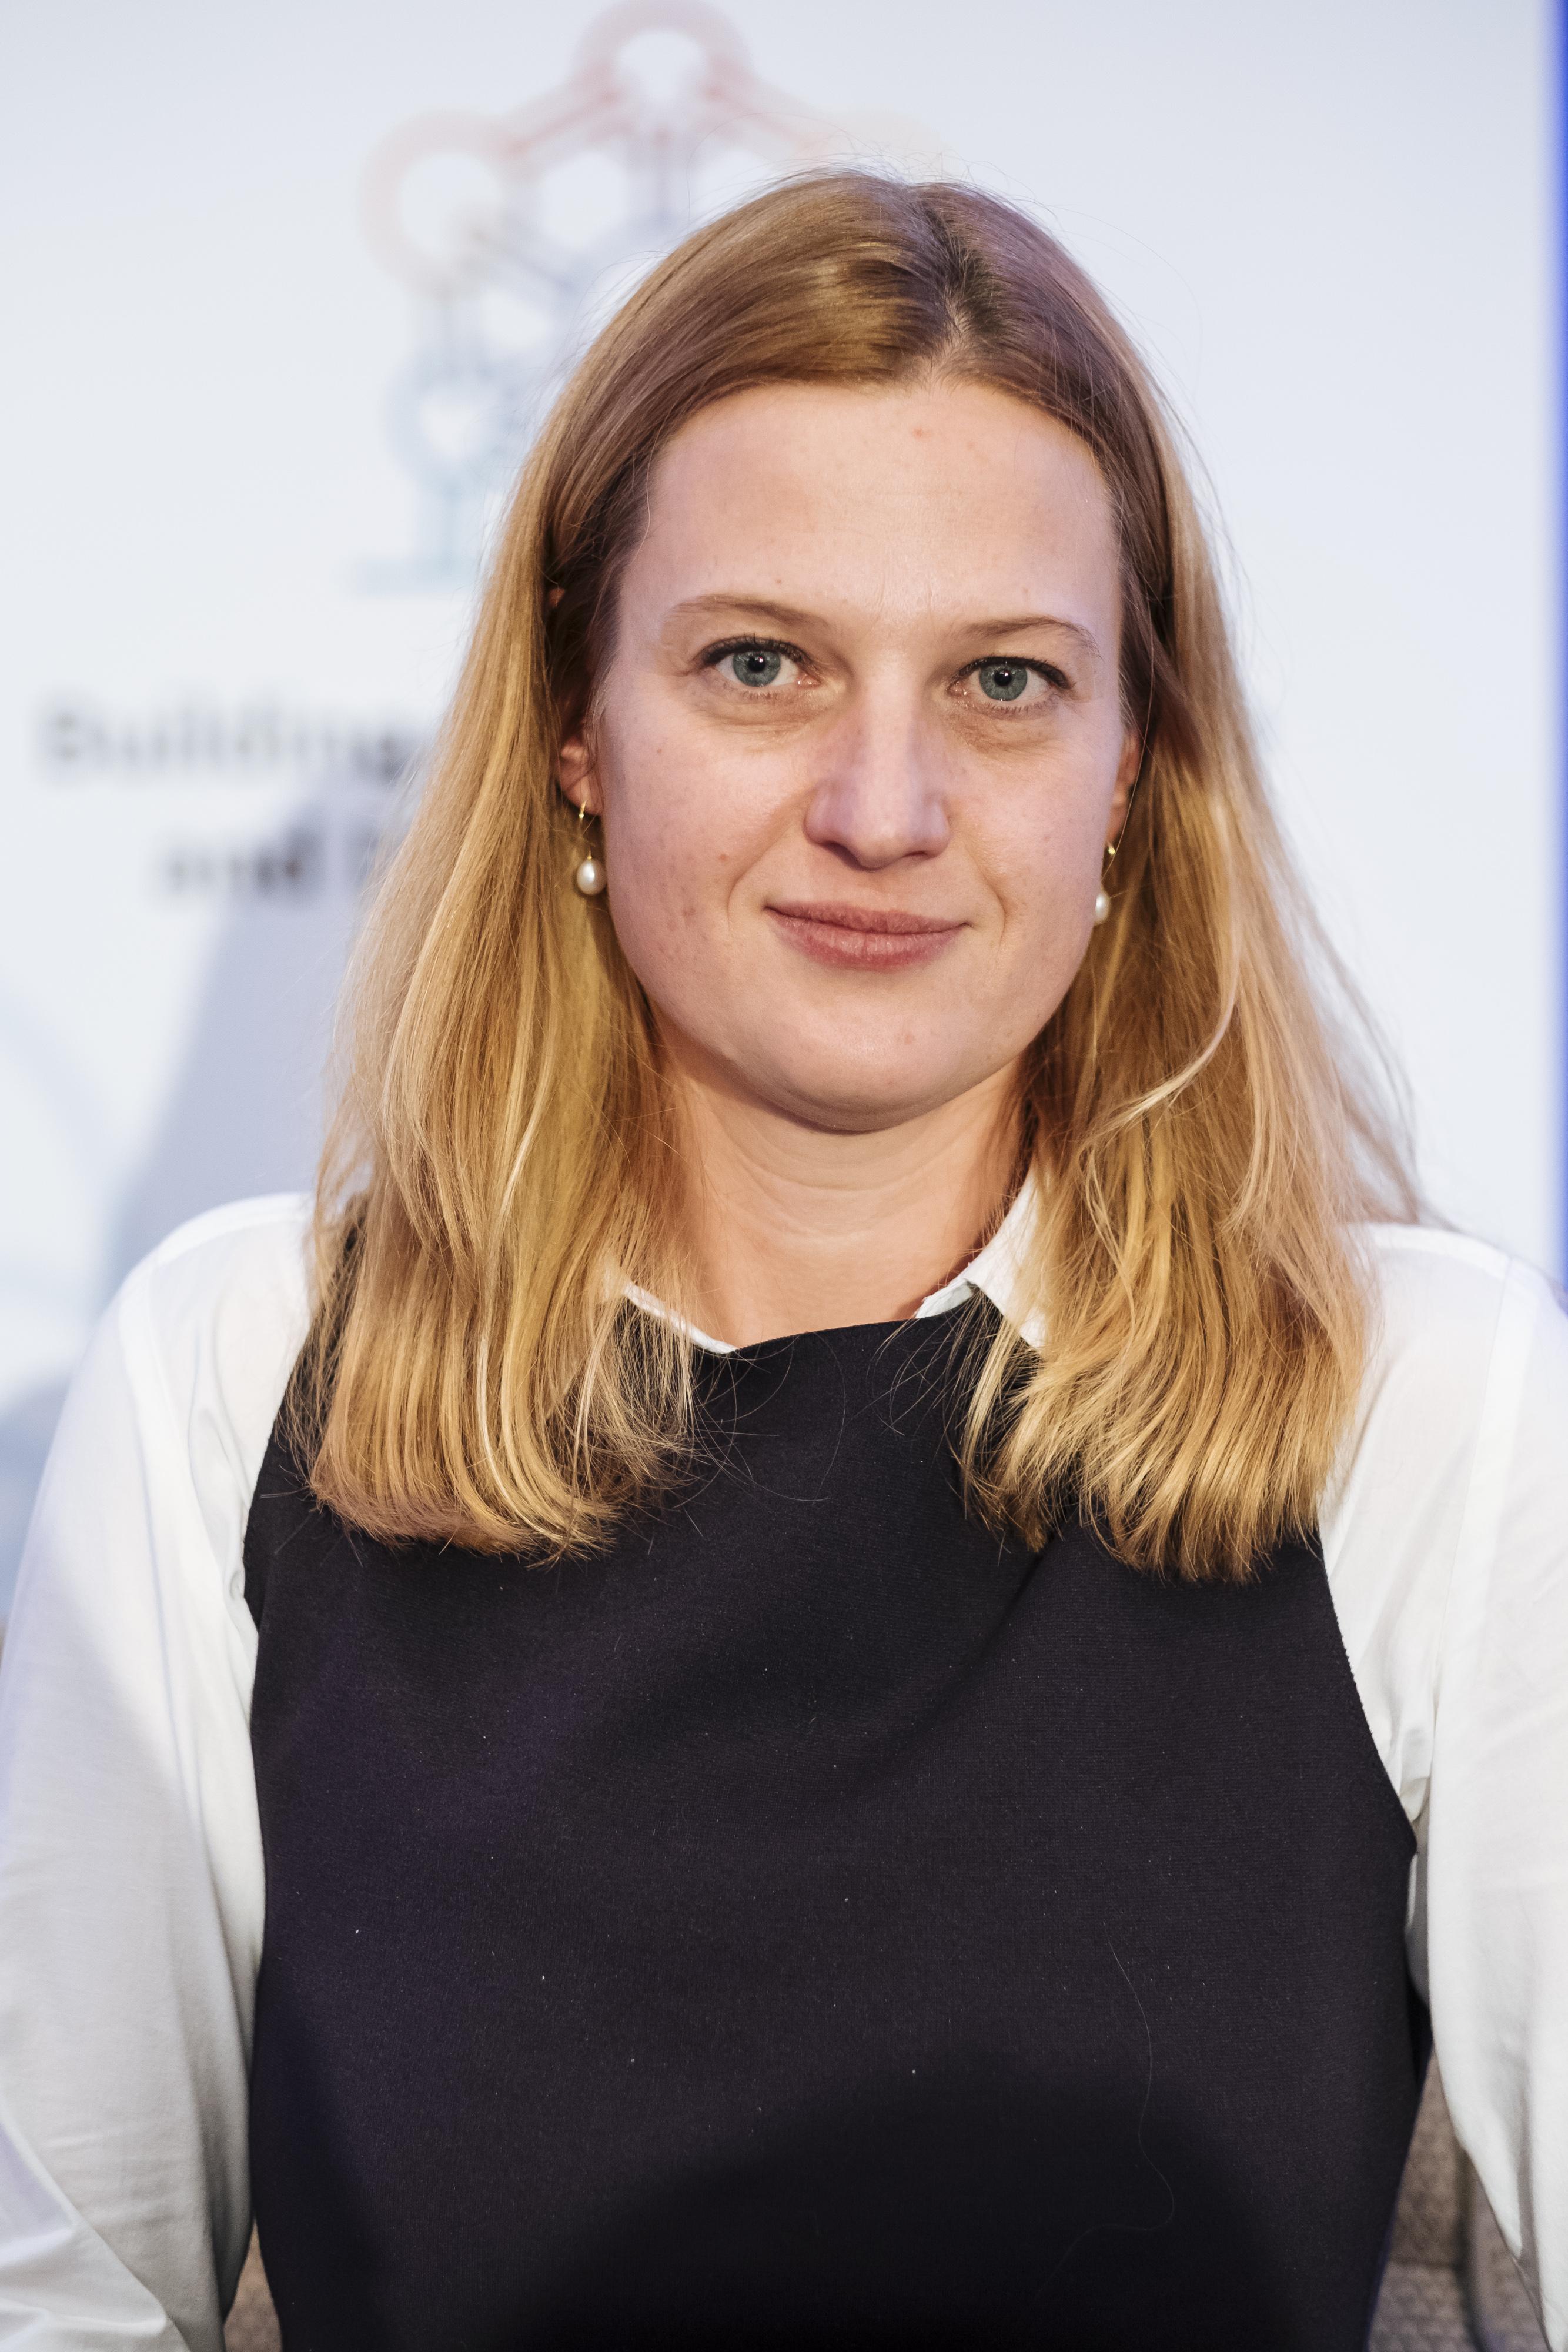 Vera Rihackova